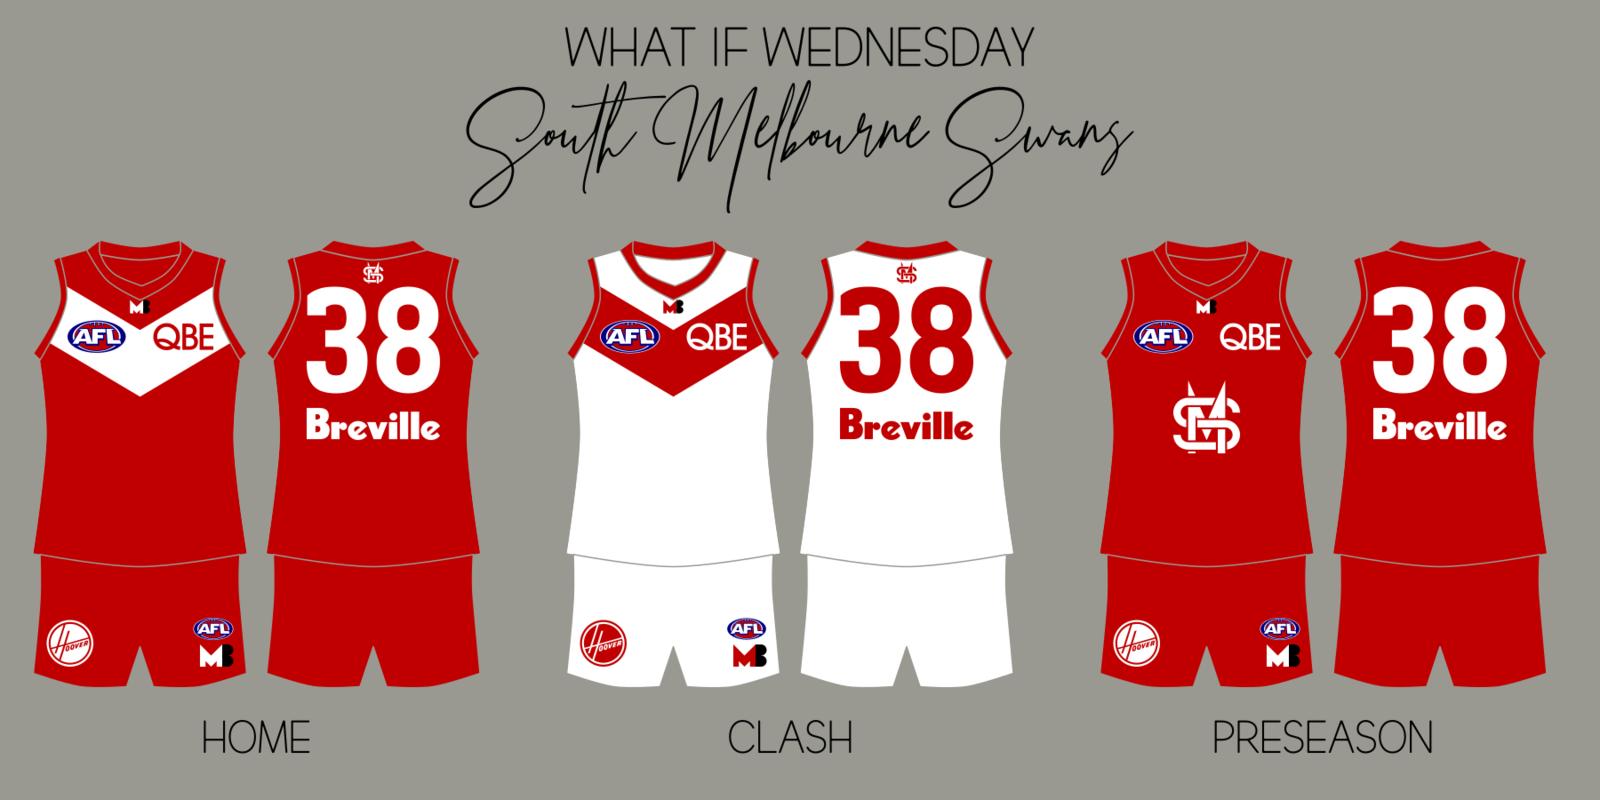 x18 South Melbourne Swans.png